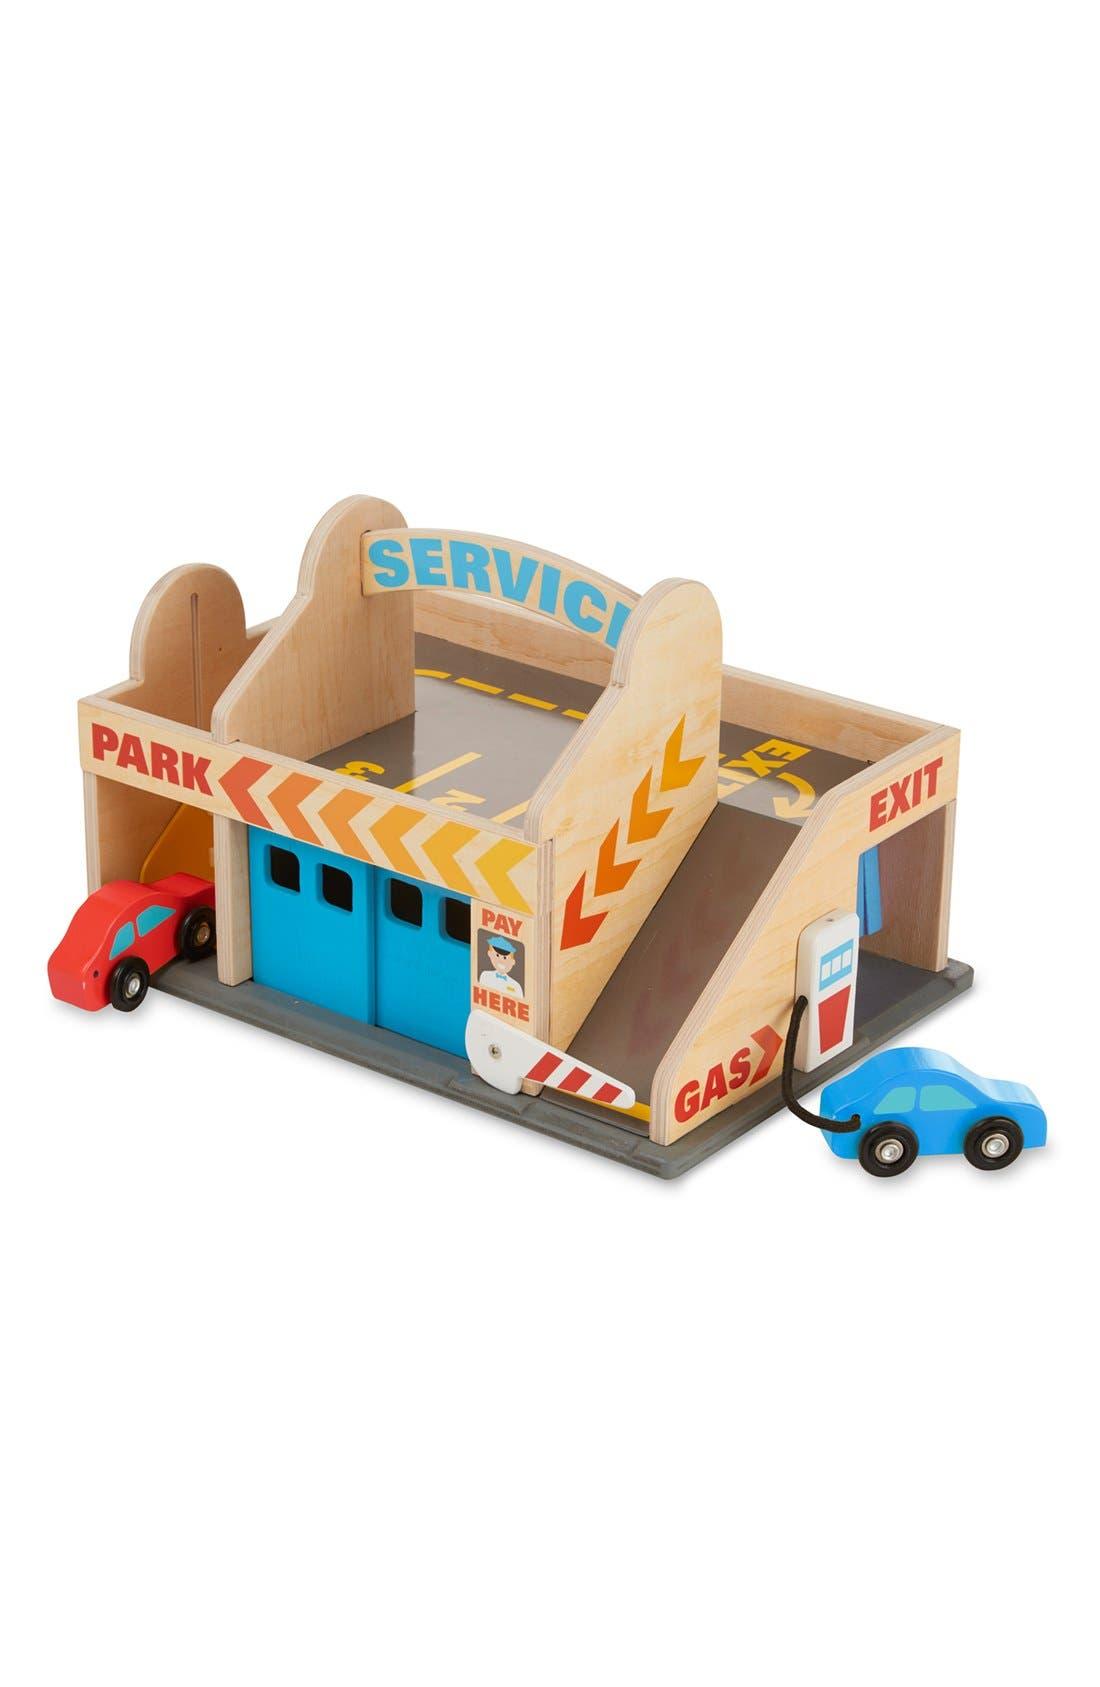 Service Station Parking Garage,                             Main thumbnail 1, color,                             MULTI